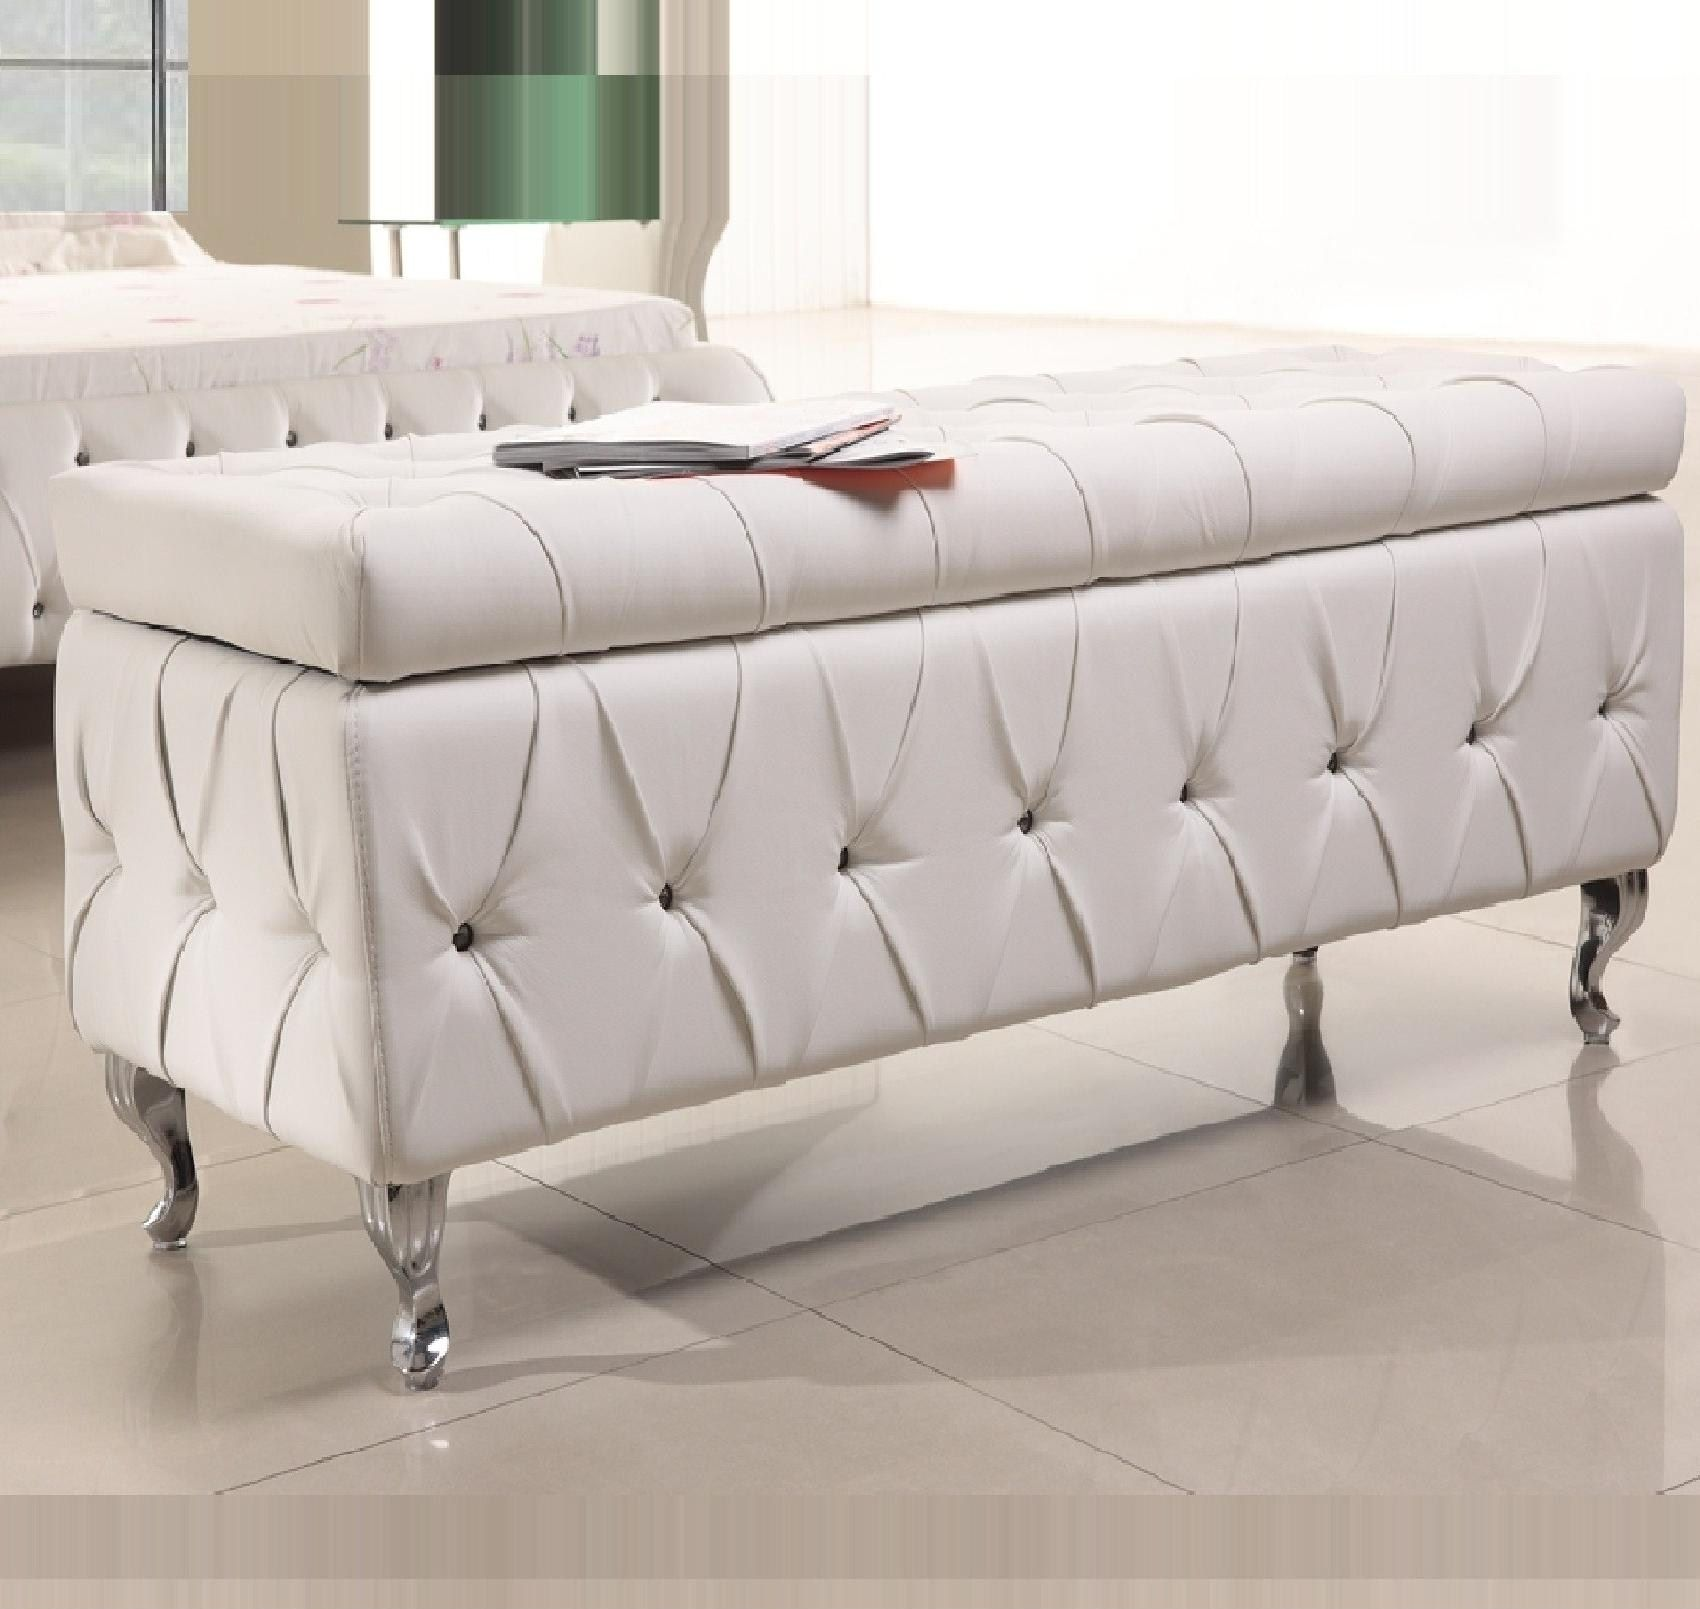 Cassapanca ikea bianca design inspiration - Ikea panca contenitore ...